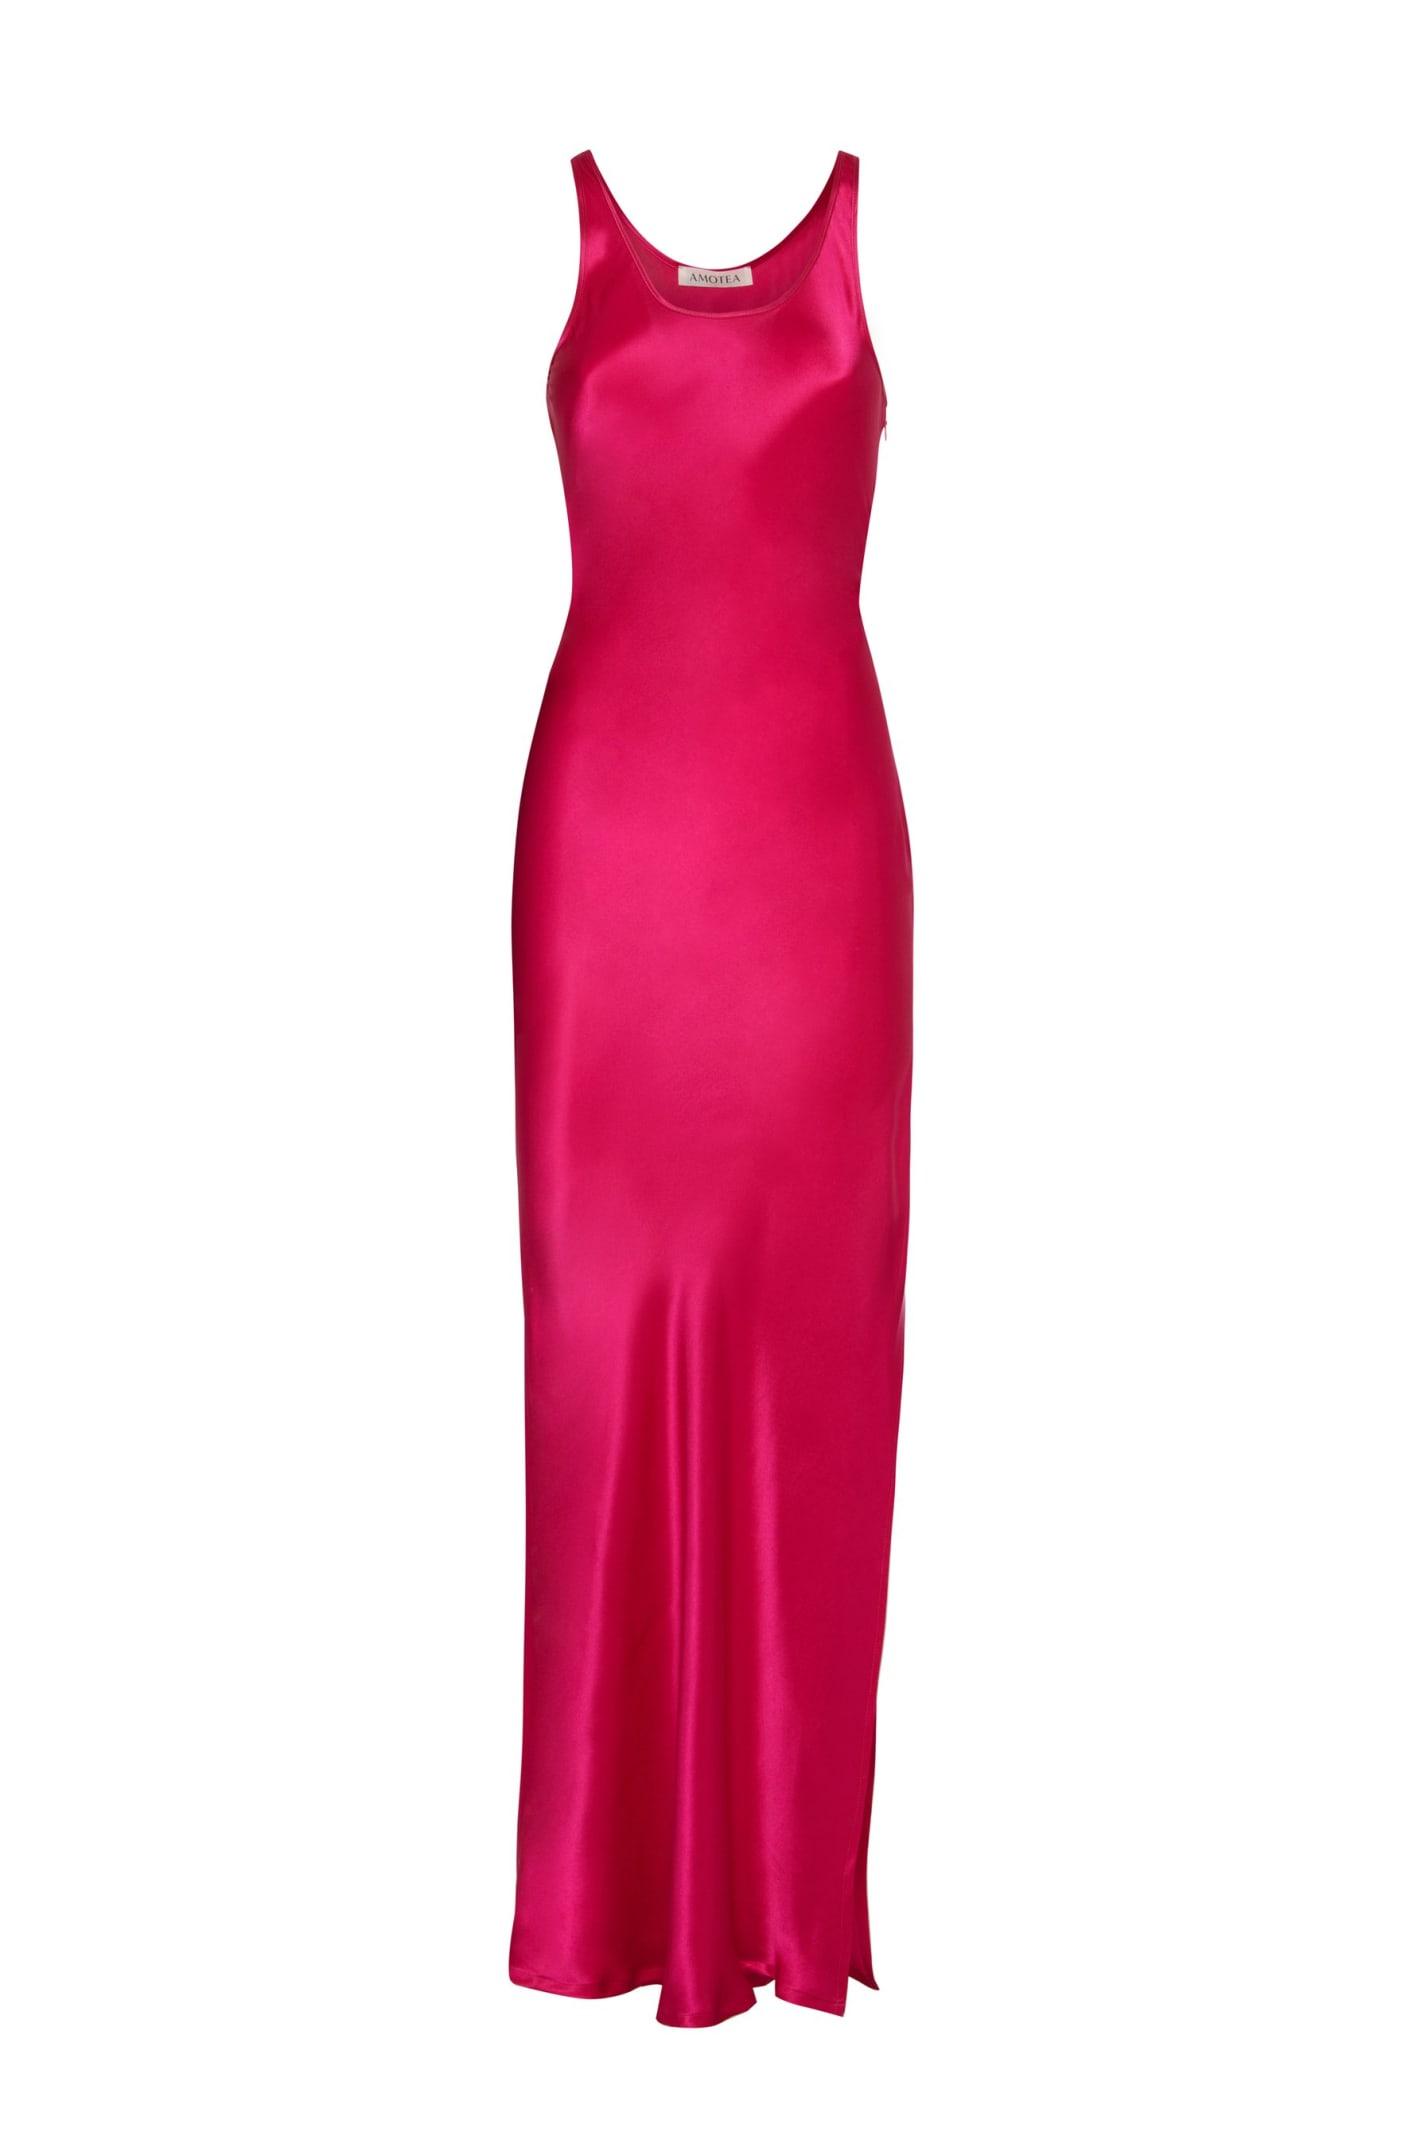 Mila Dress In Fucsia Satin